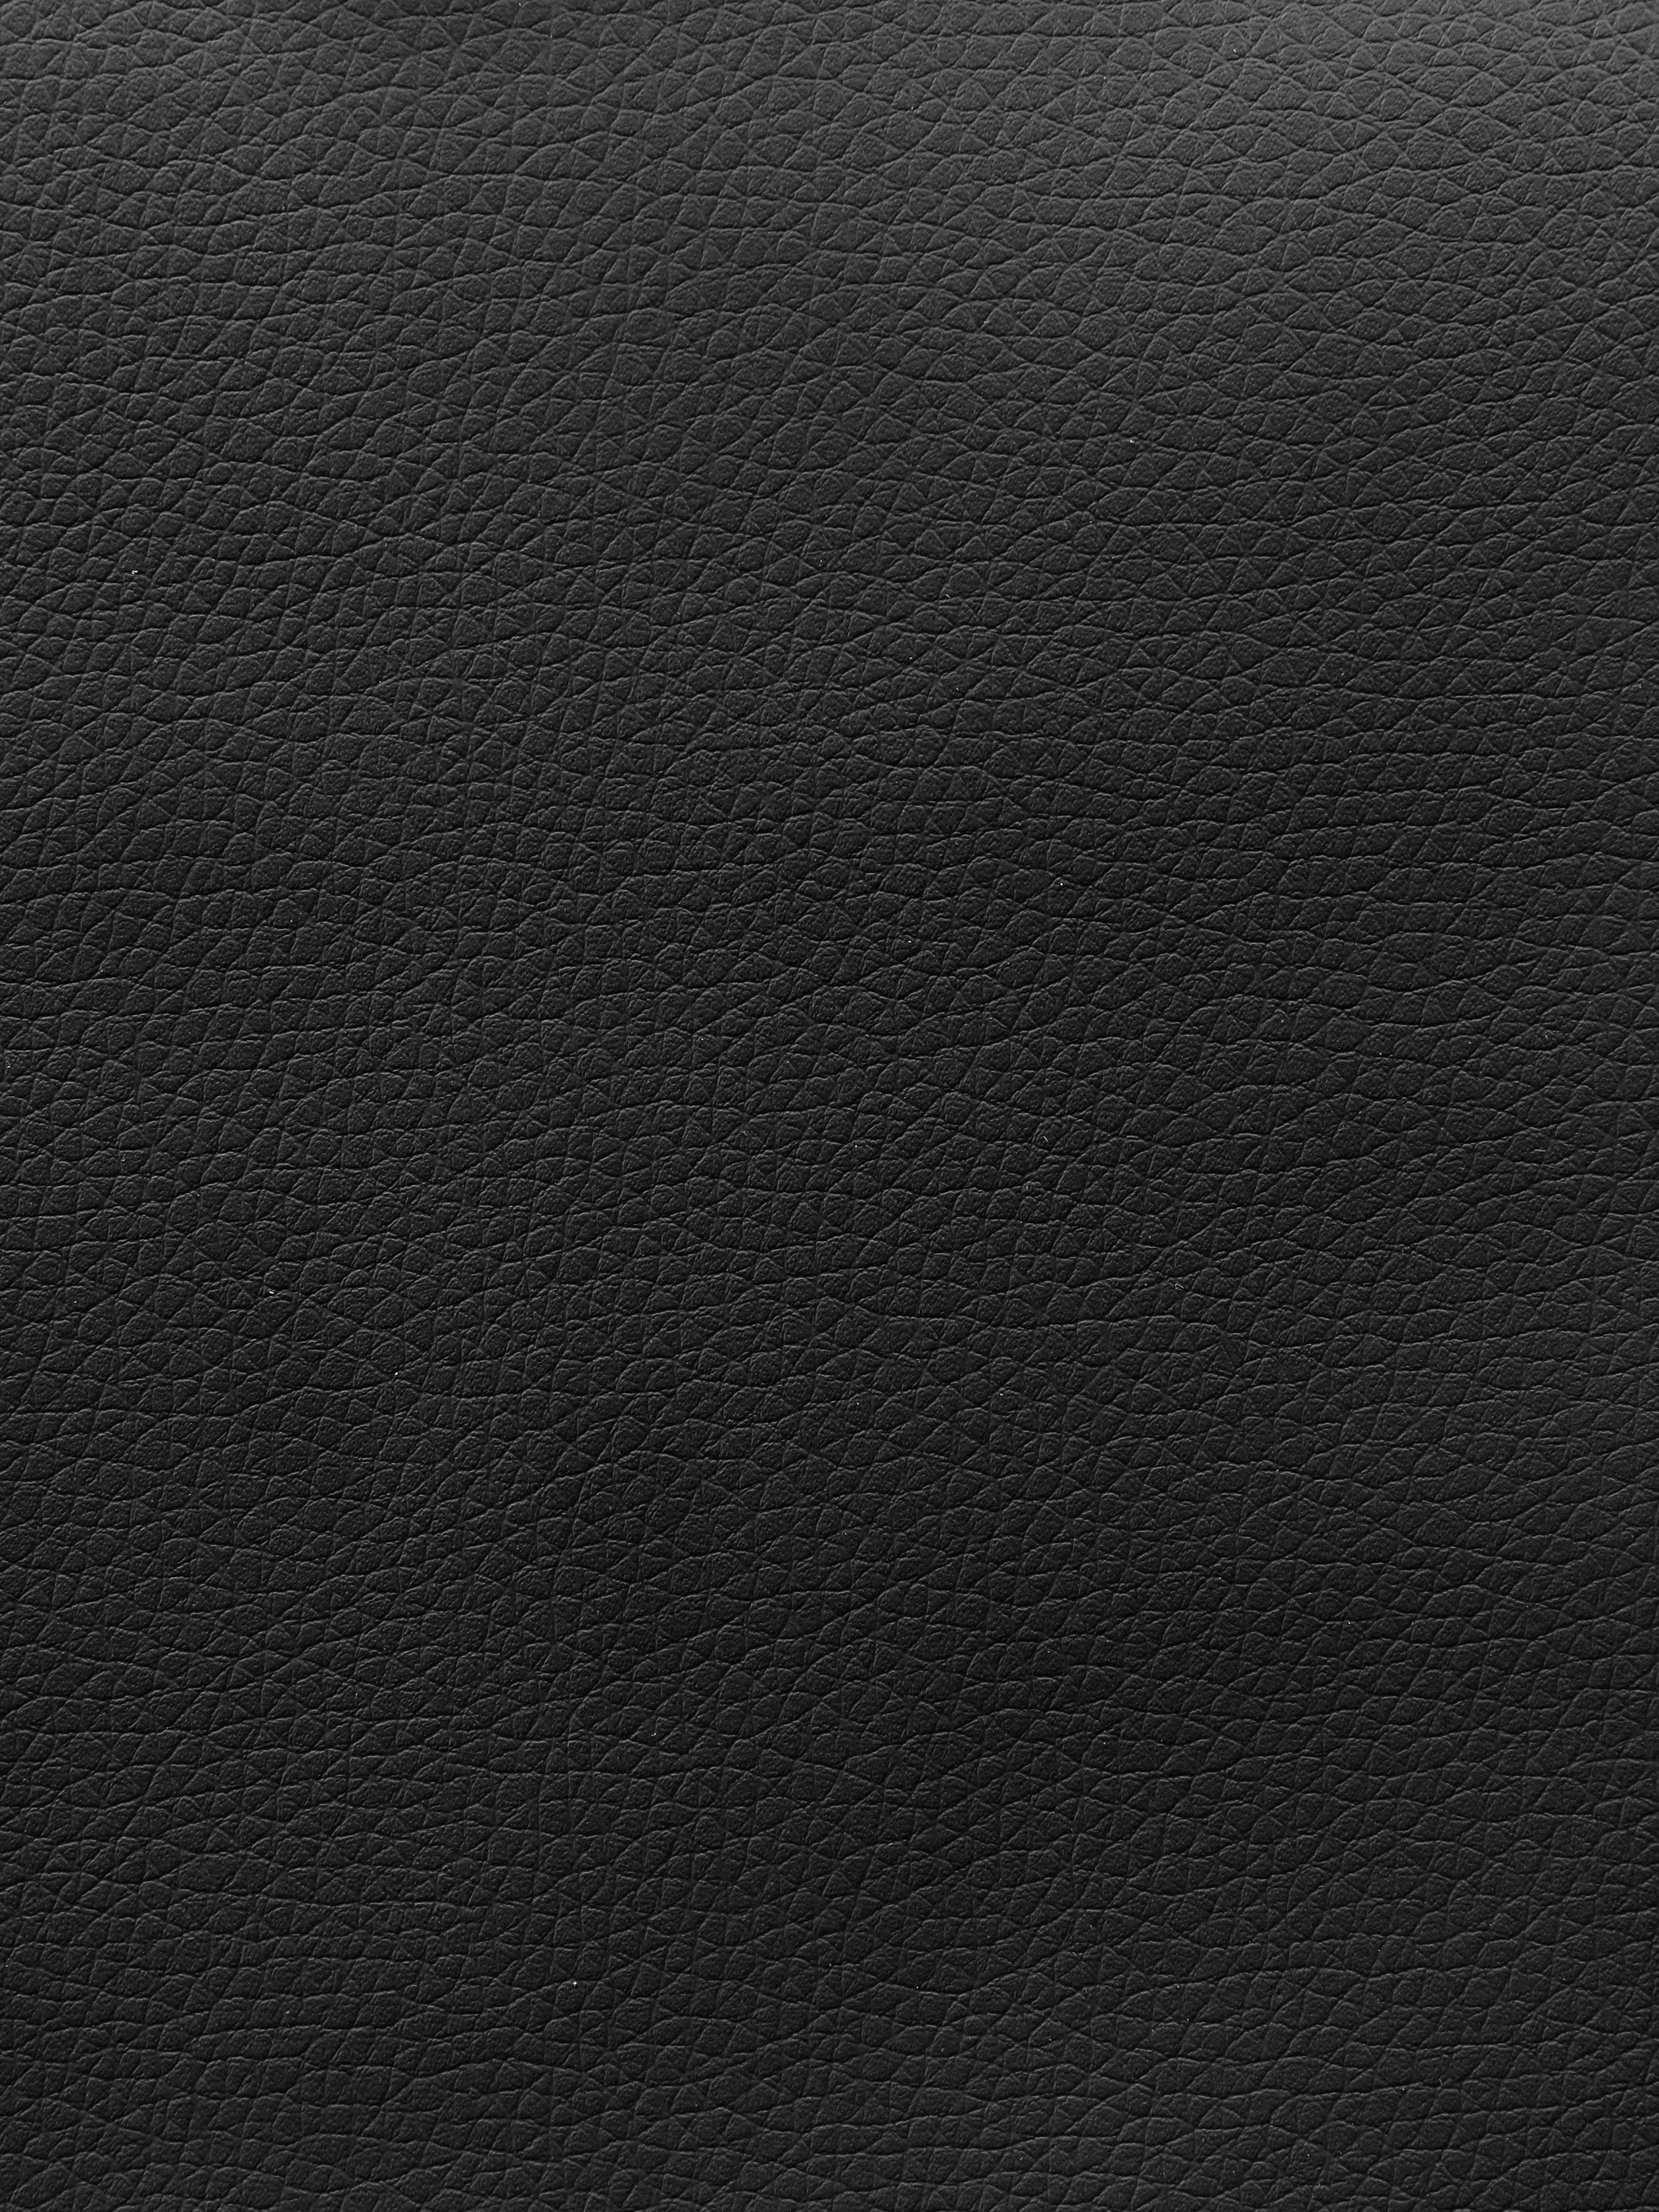 x Wallpaper dark background texture Textures Leather